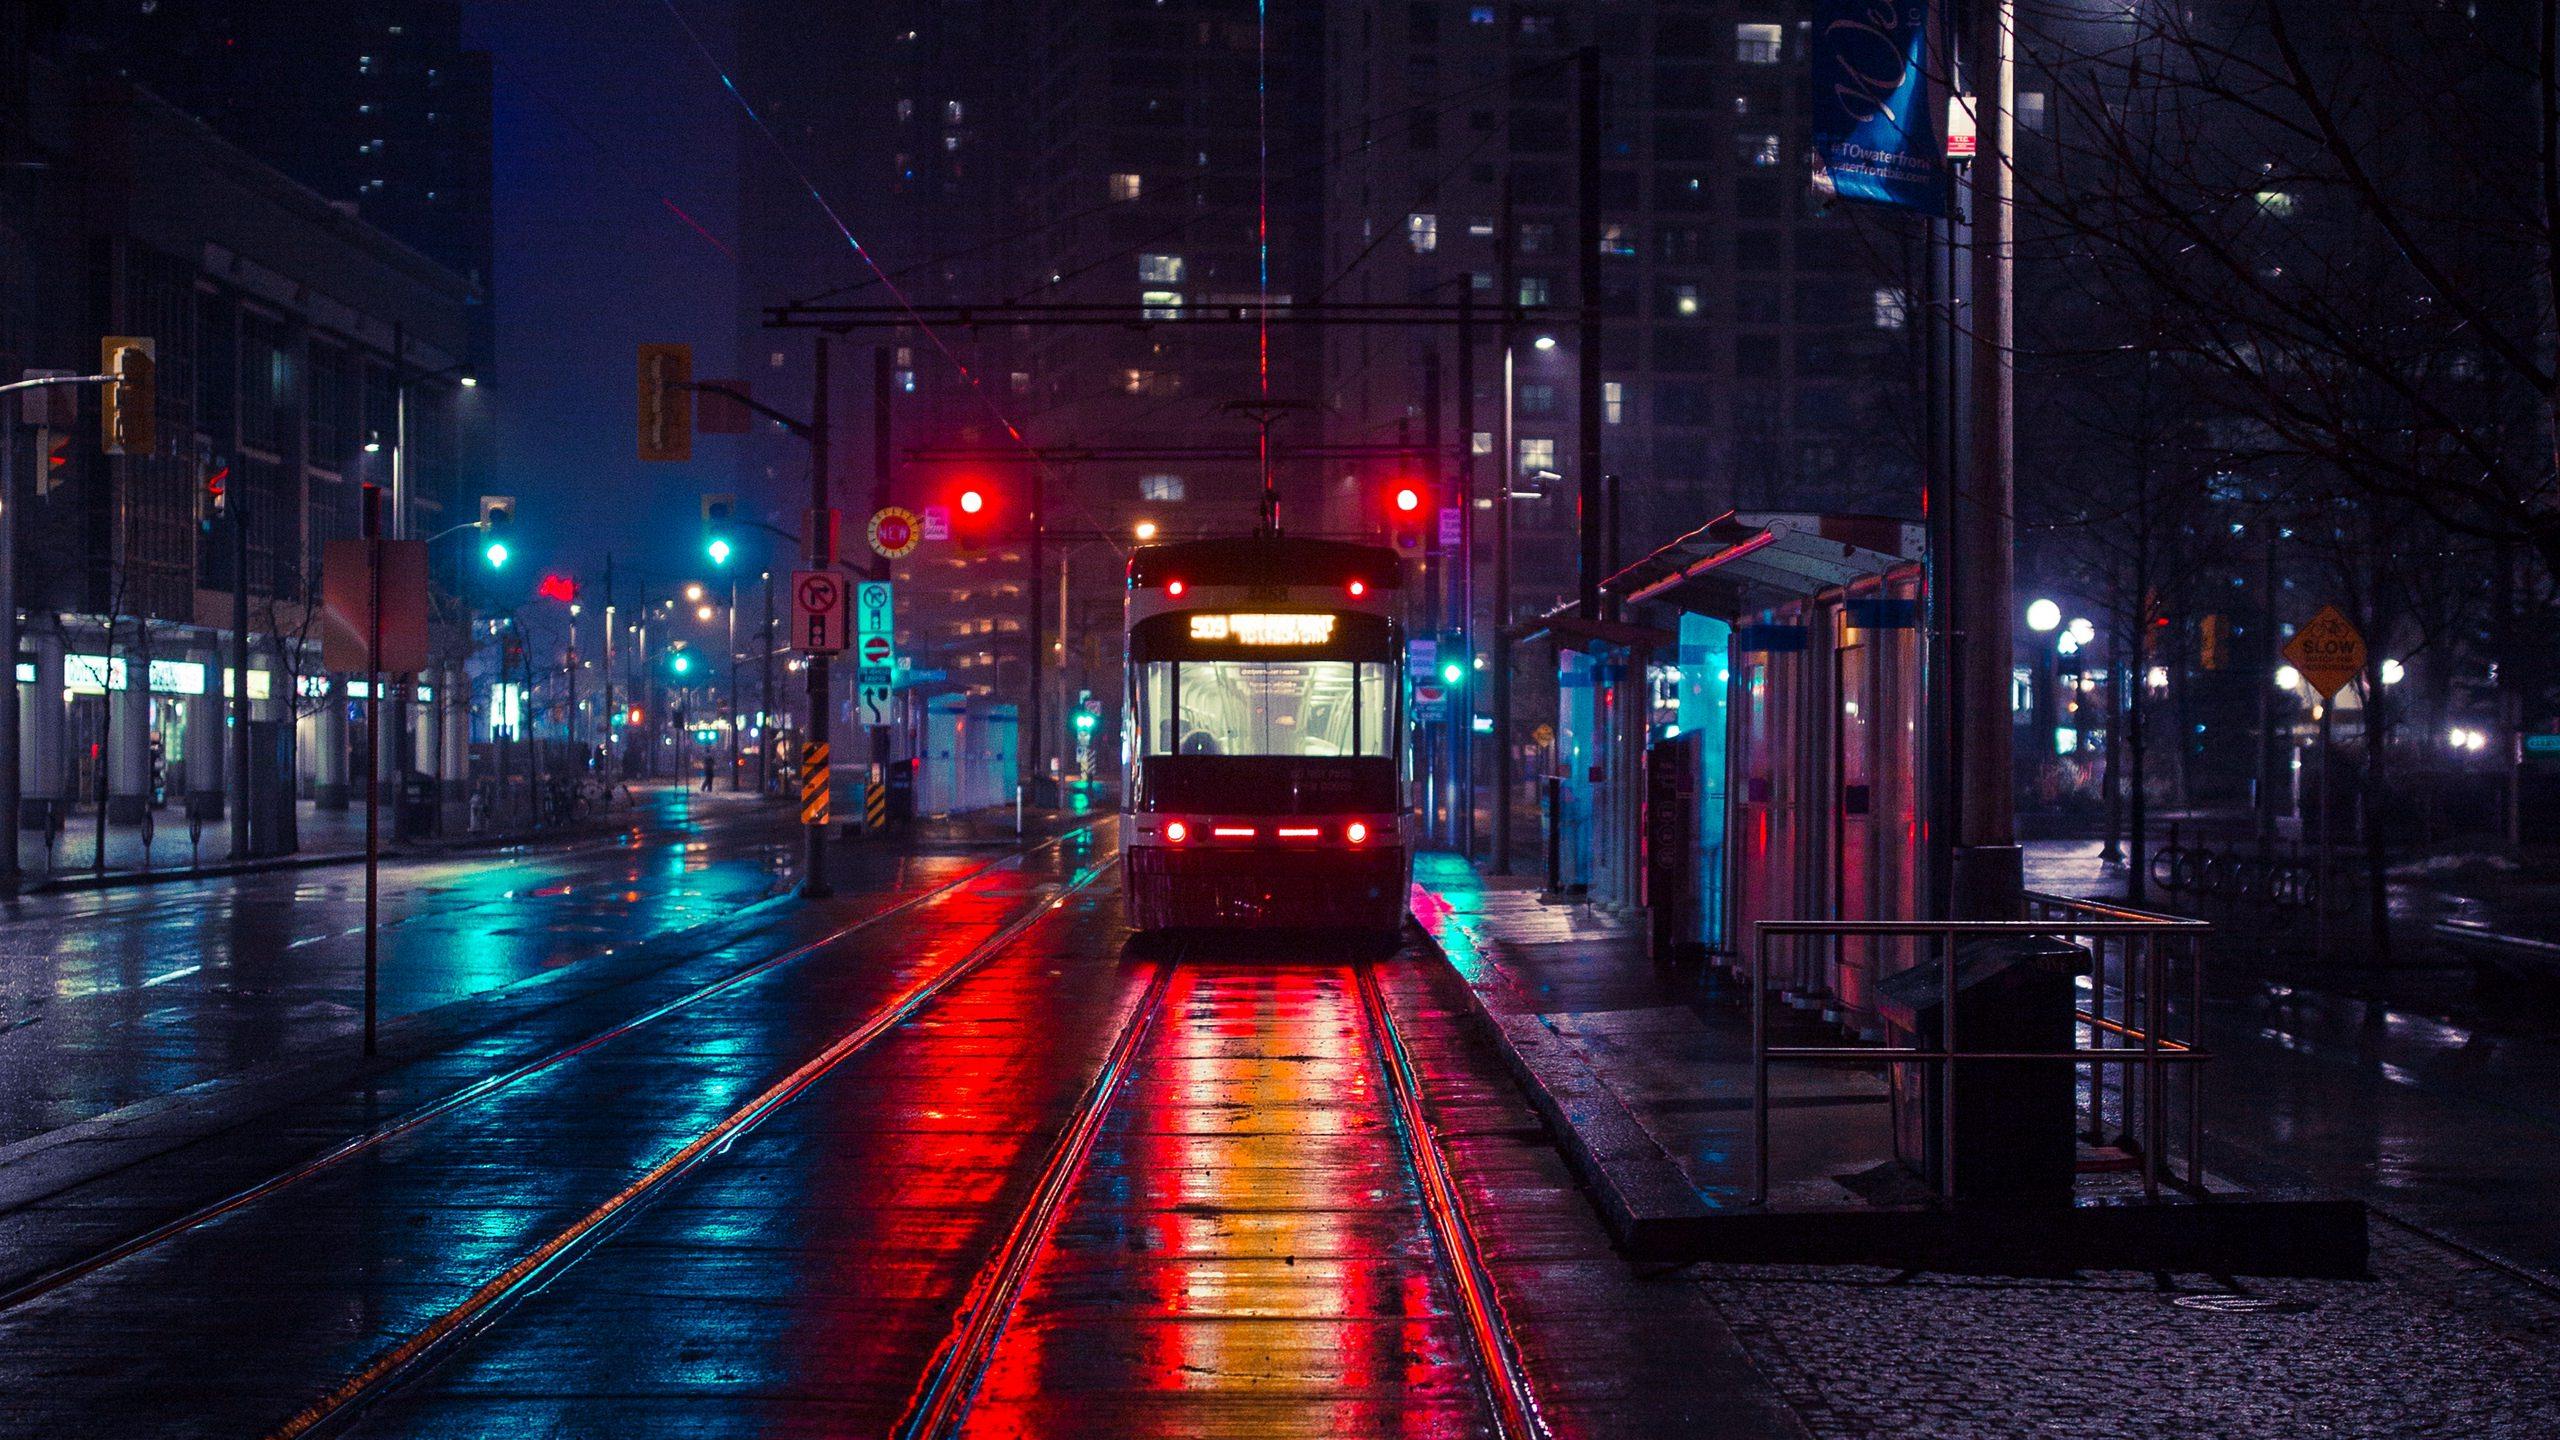 Tram Hd Wallpaper Background Image 2560x1440 Id961977